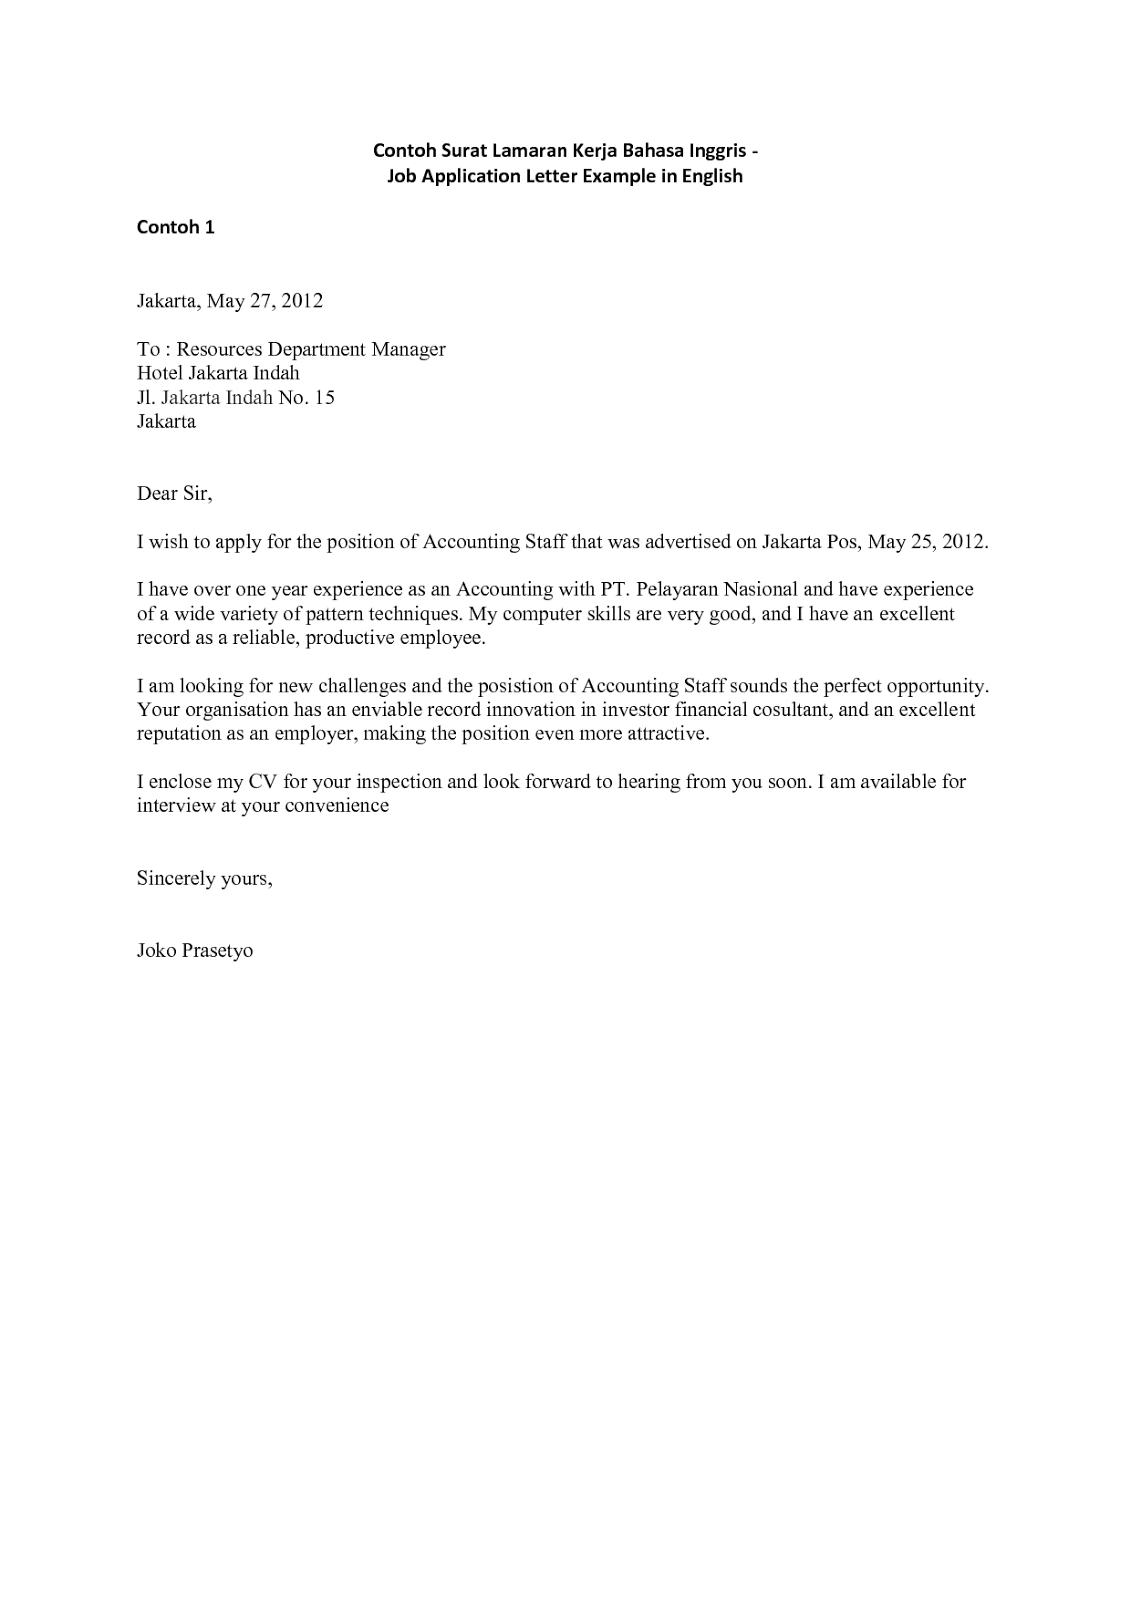 Contoh Surat Lamaran Kerja Bahasa Inggris yang Simple